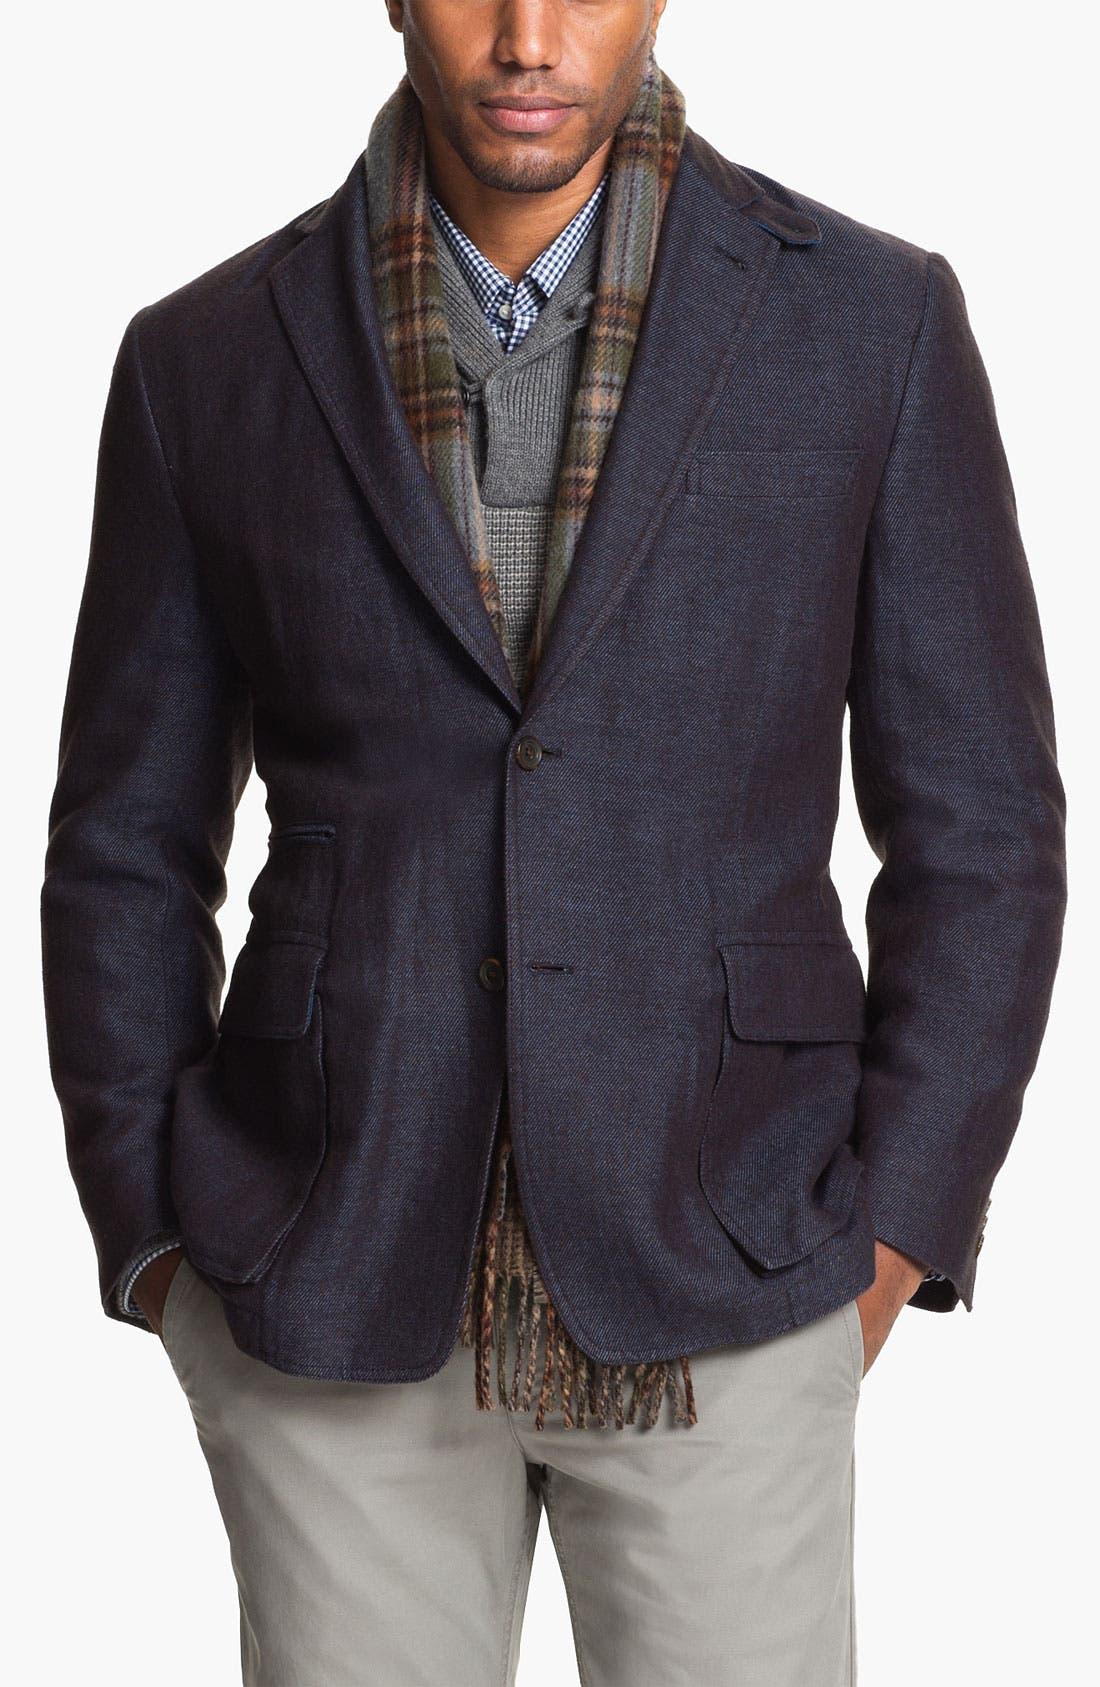 Alternate Image 1 Selected - Kroon 'Waits' Linen & Wool Blend Sportcoat